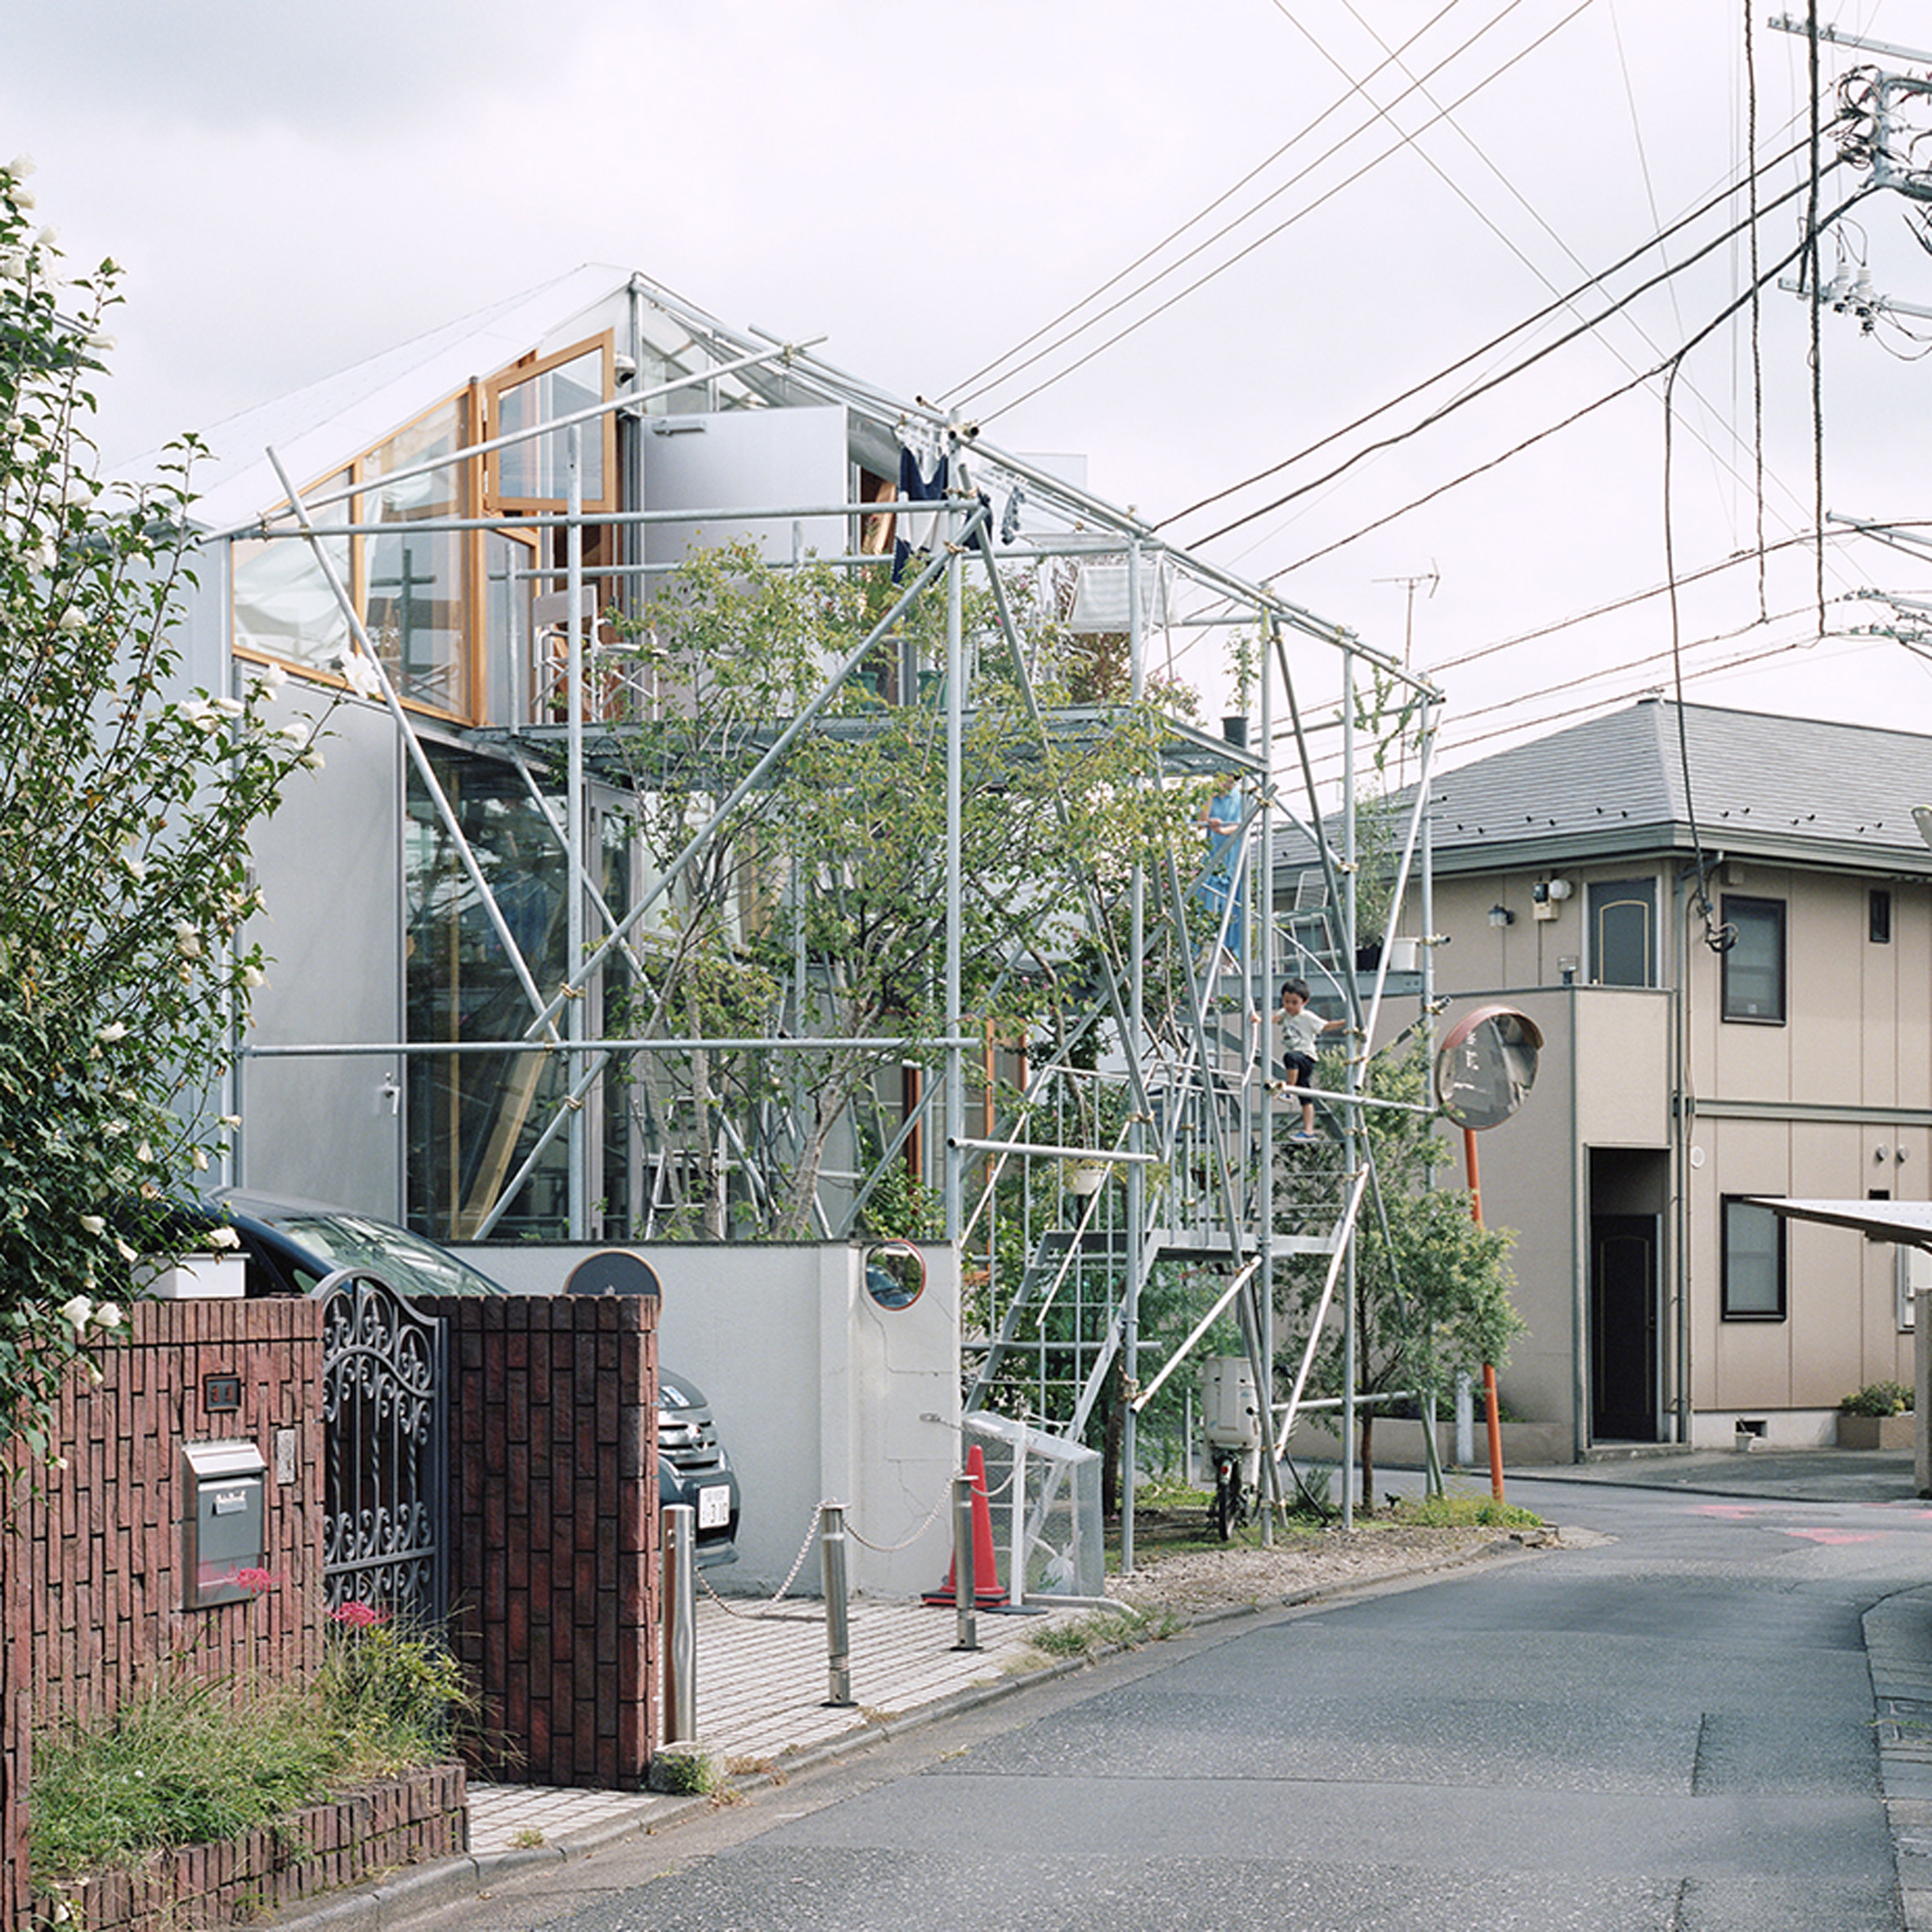 The scaffold facade of Daita2019, Japan, by Suzuko Yamada